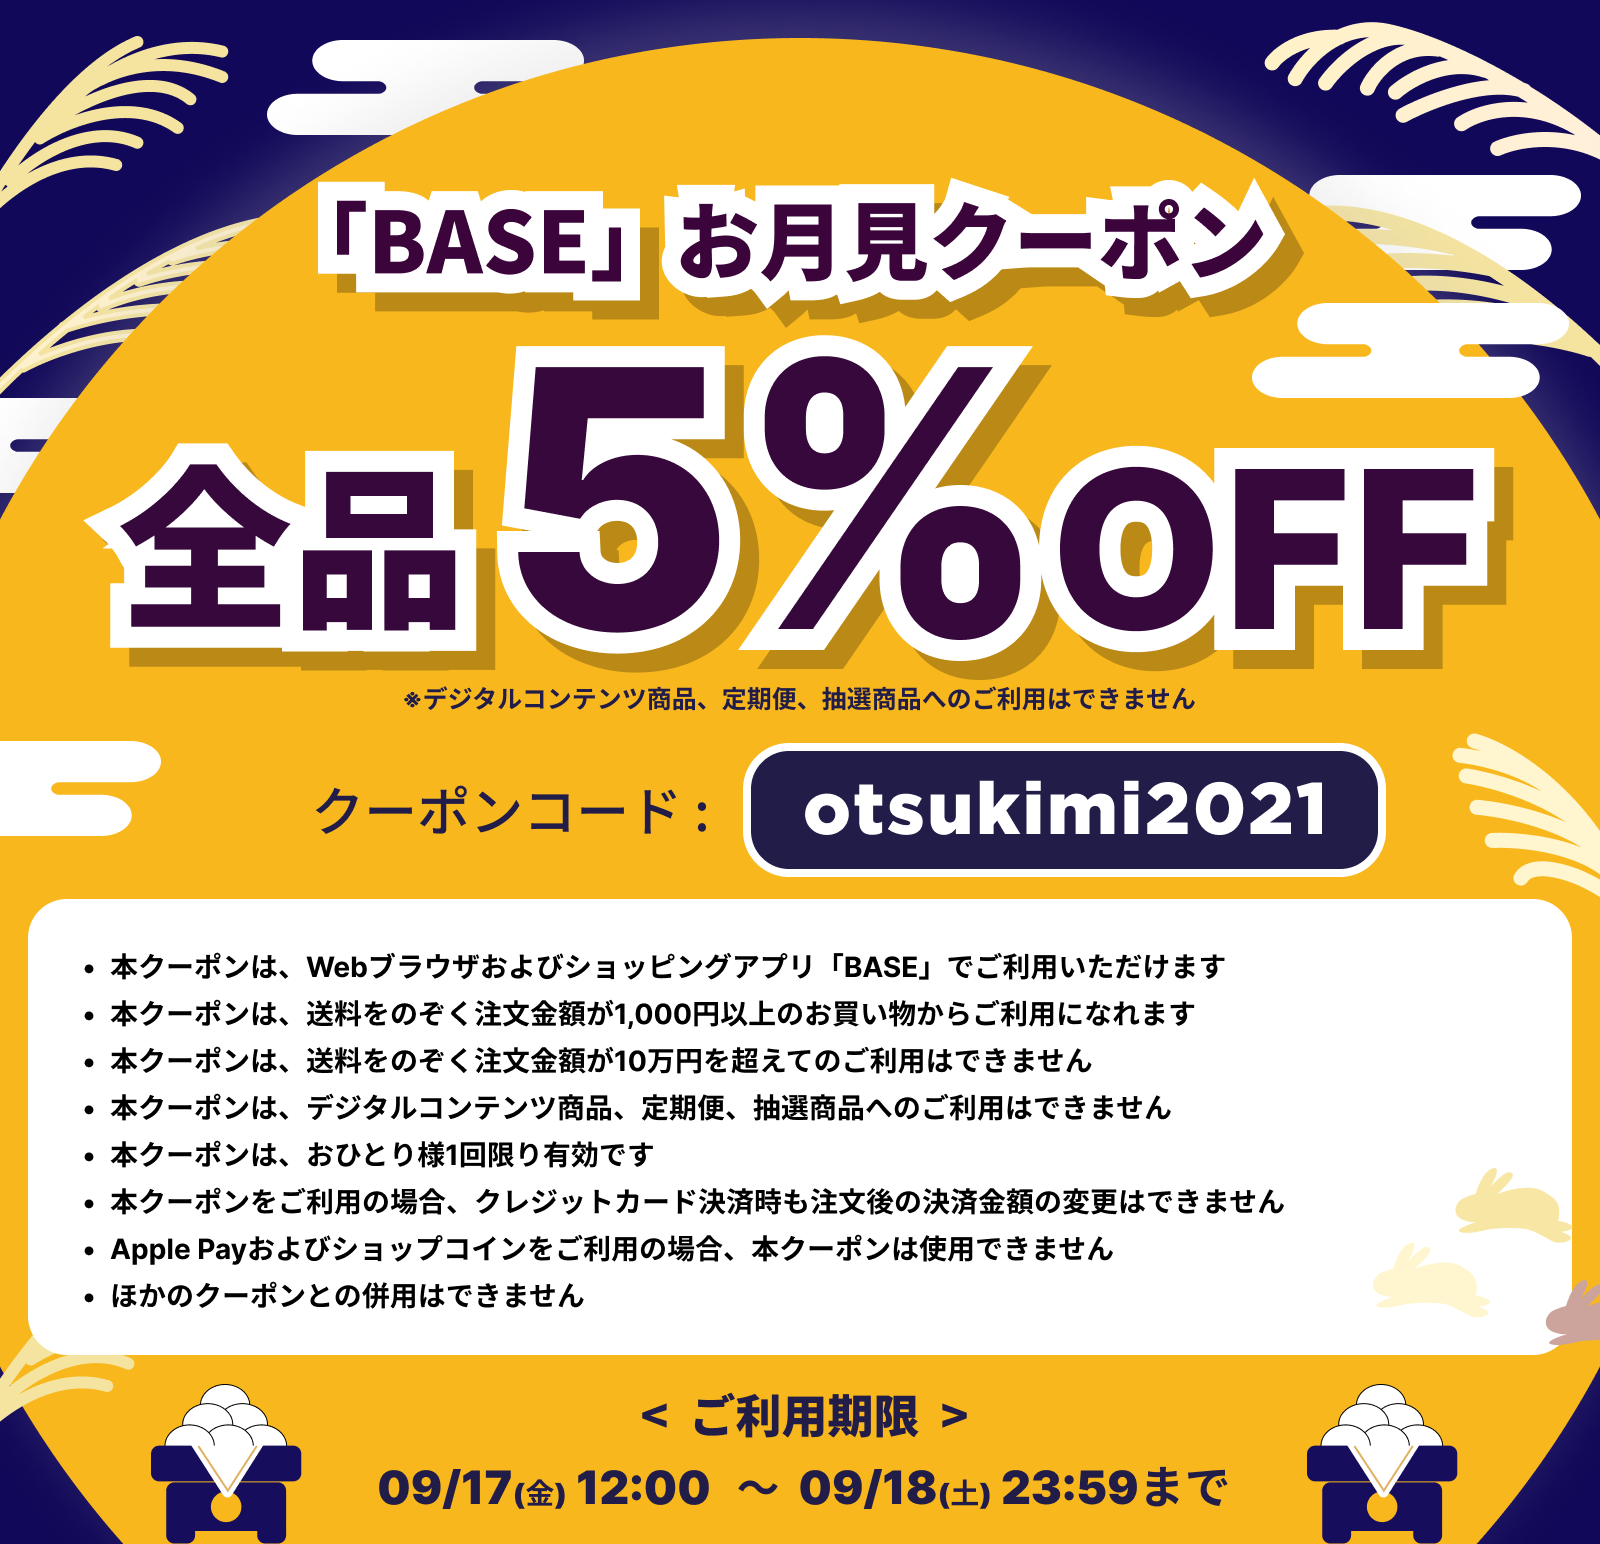 ☆☆5%OFFお月見クーポンが天使音マスクメロン公式ショッピングモールで使えます☆☆